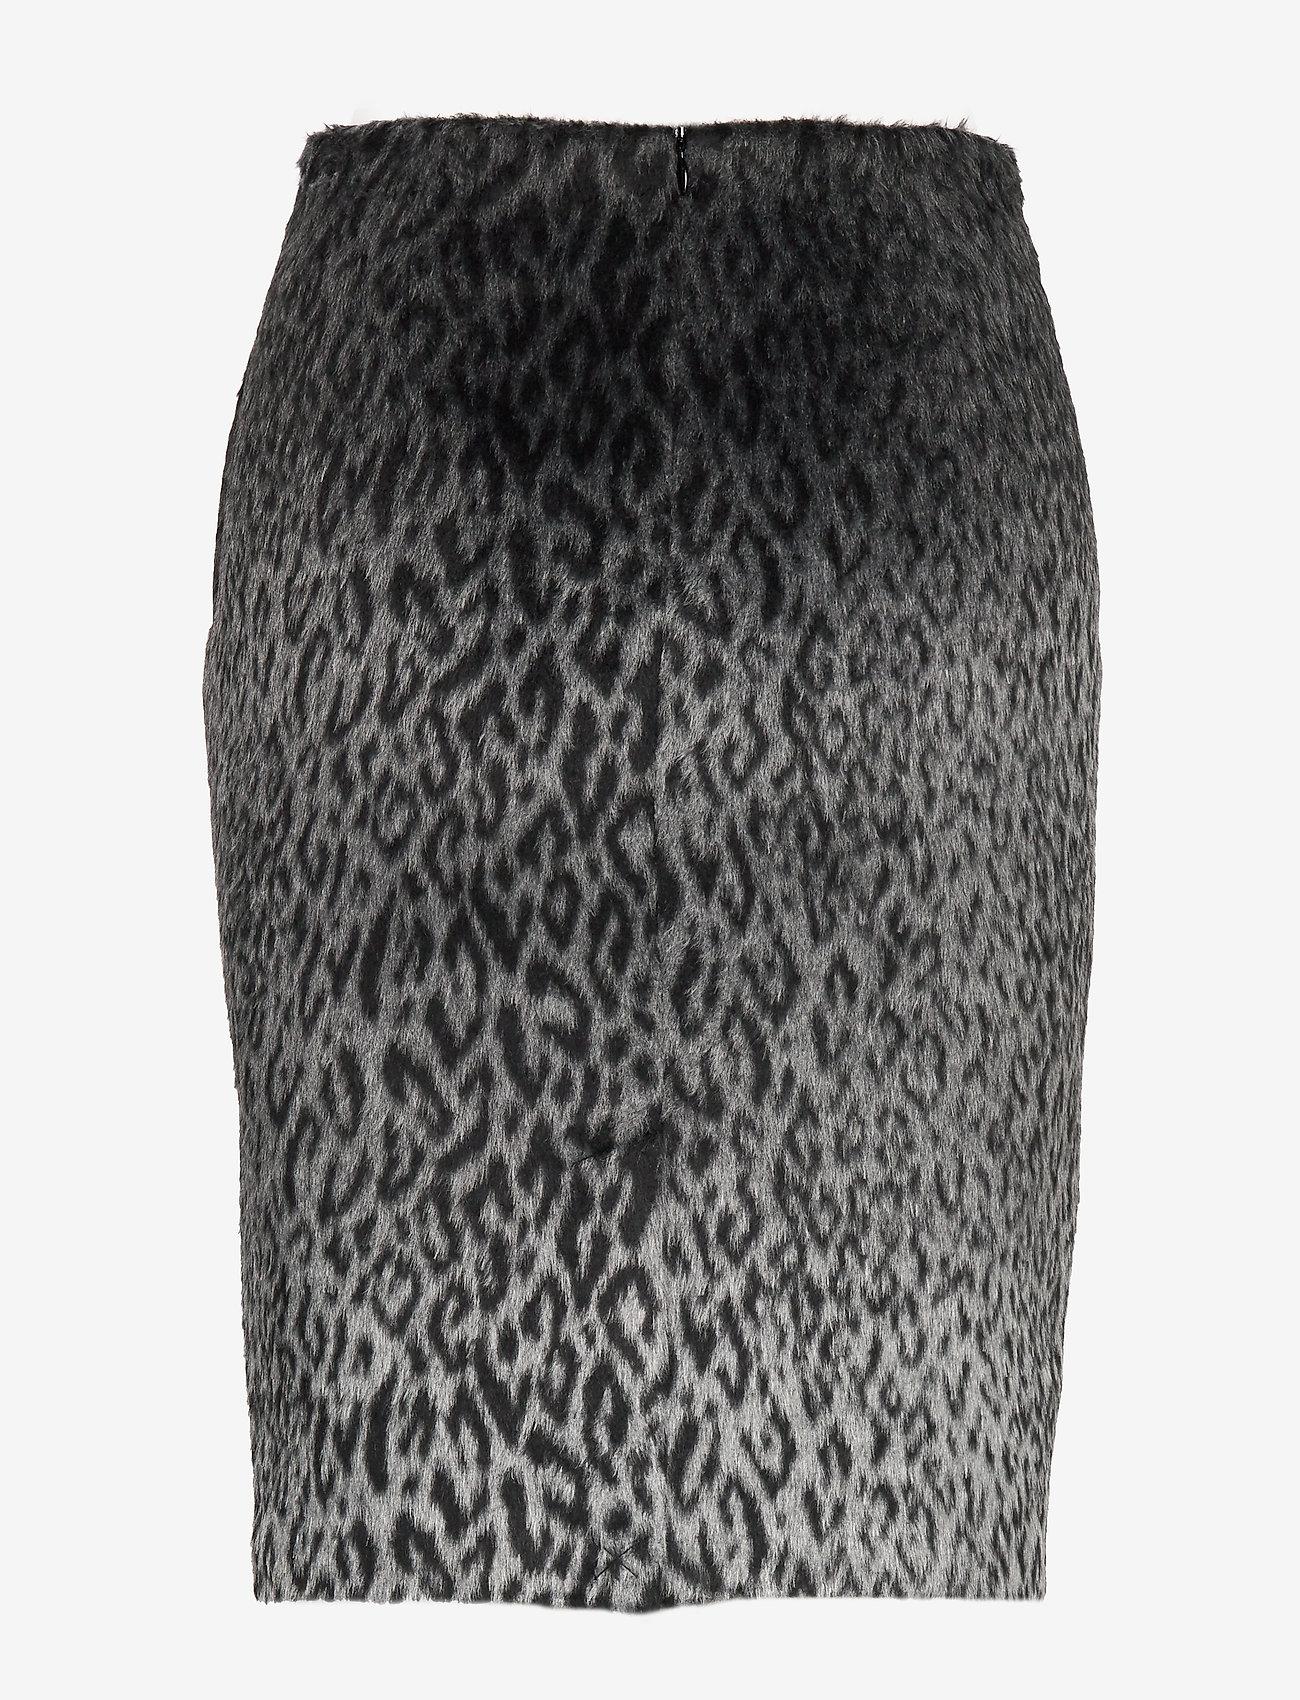 Karl Lagerfeld - Karl X Carine Leopard Skirt - kynähame - black/gray - 1